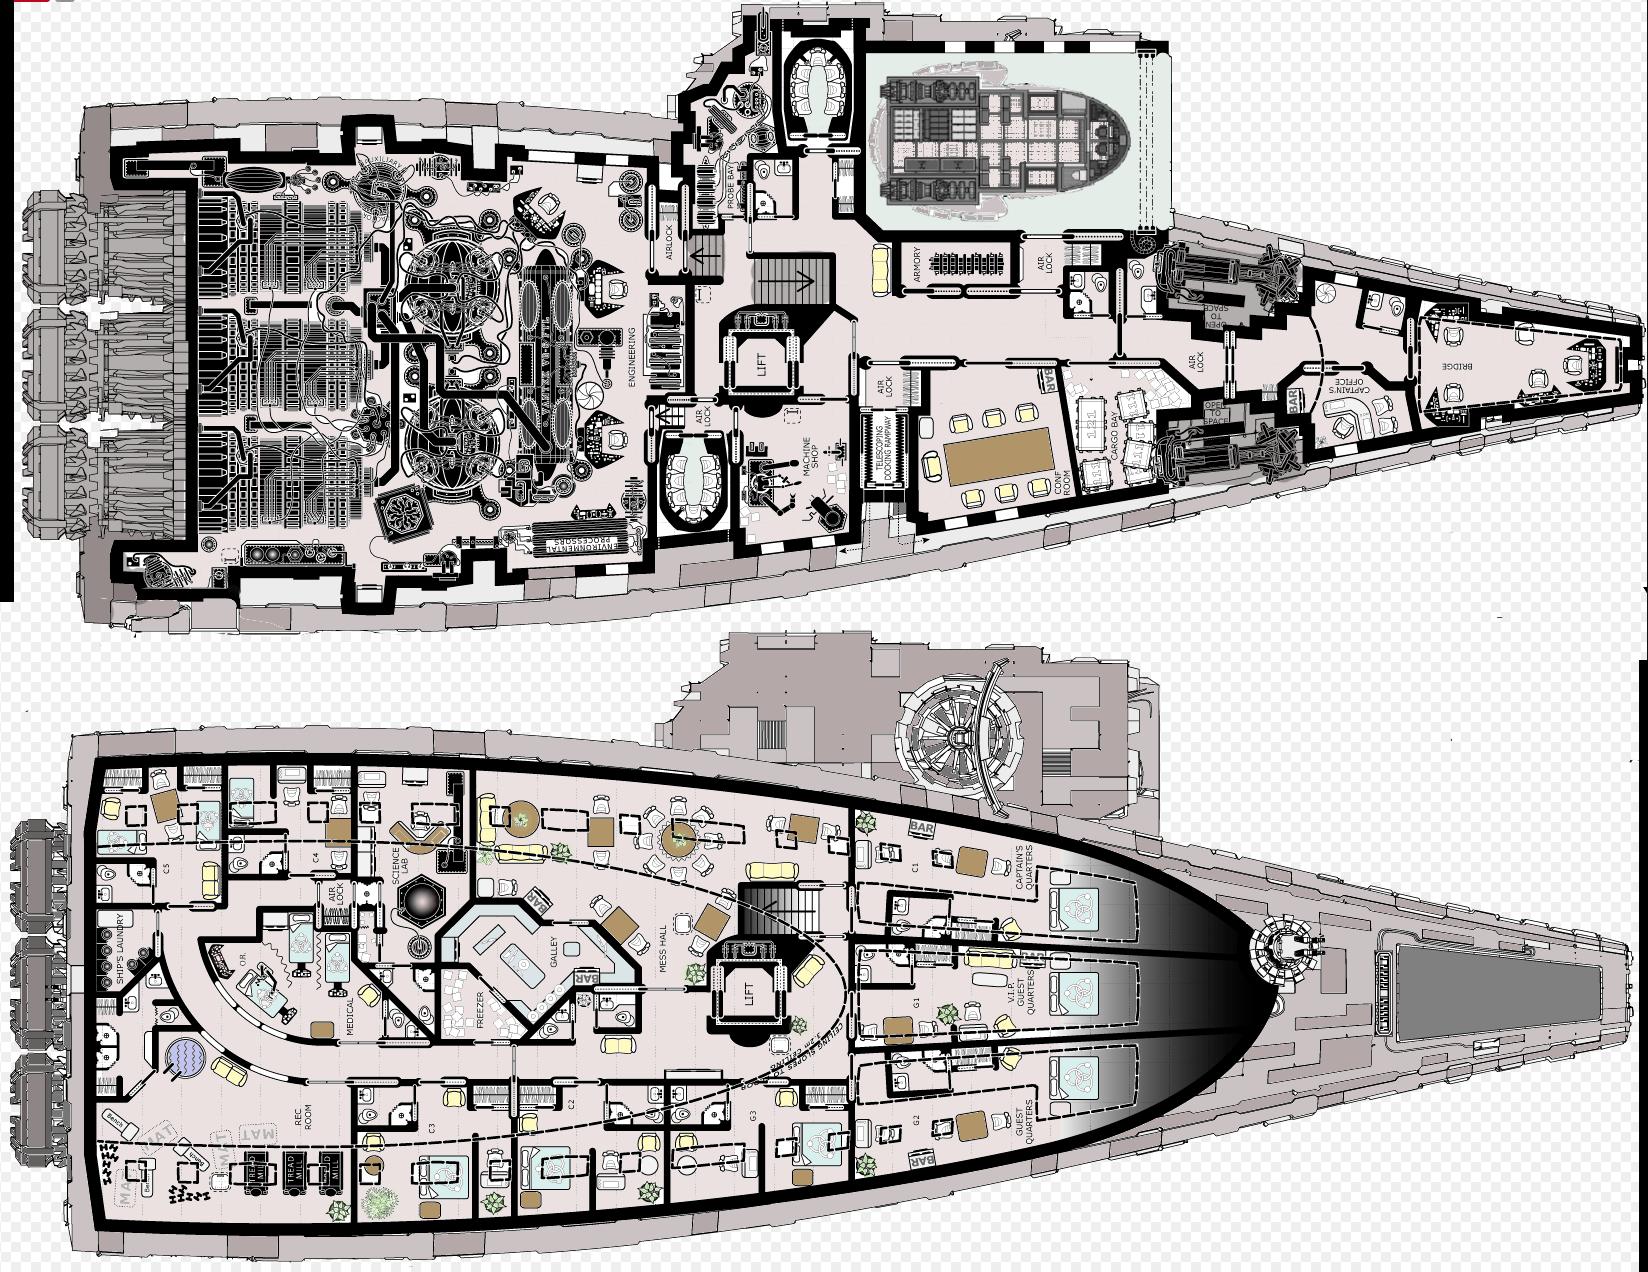 Star Wars Ship Floor Plans Part - 19: Spaceship Interior, Spaceship Design, Star Ship, Fantasy Map, Starwars, Deck  Plans, Ship Map, Sci Fi Spaceships, Star Wars Rpg